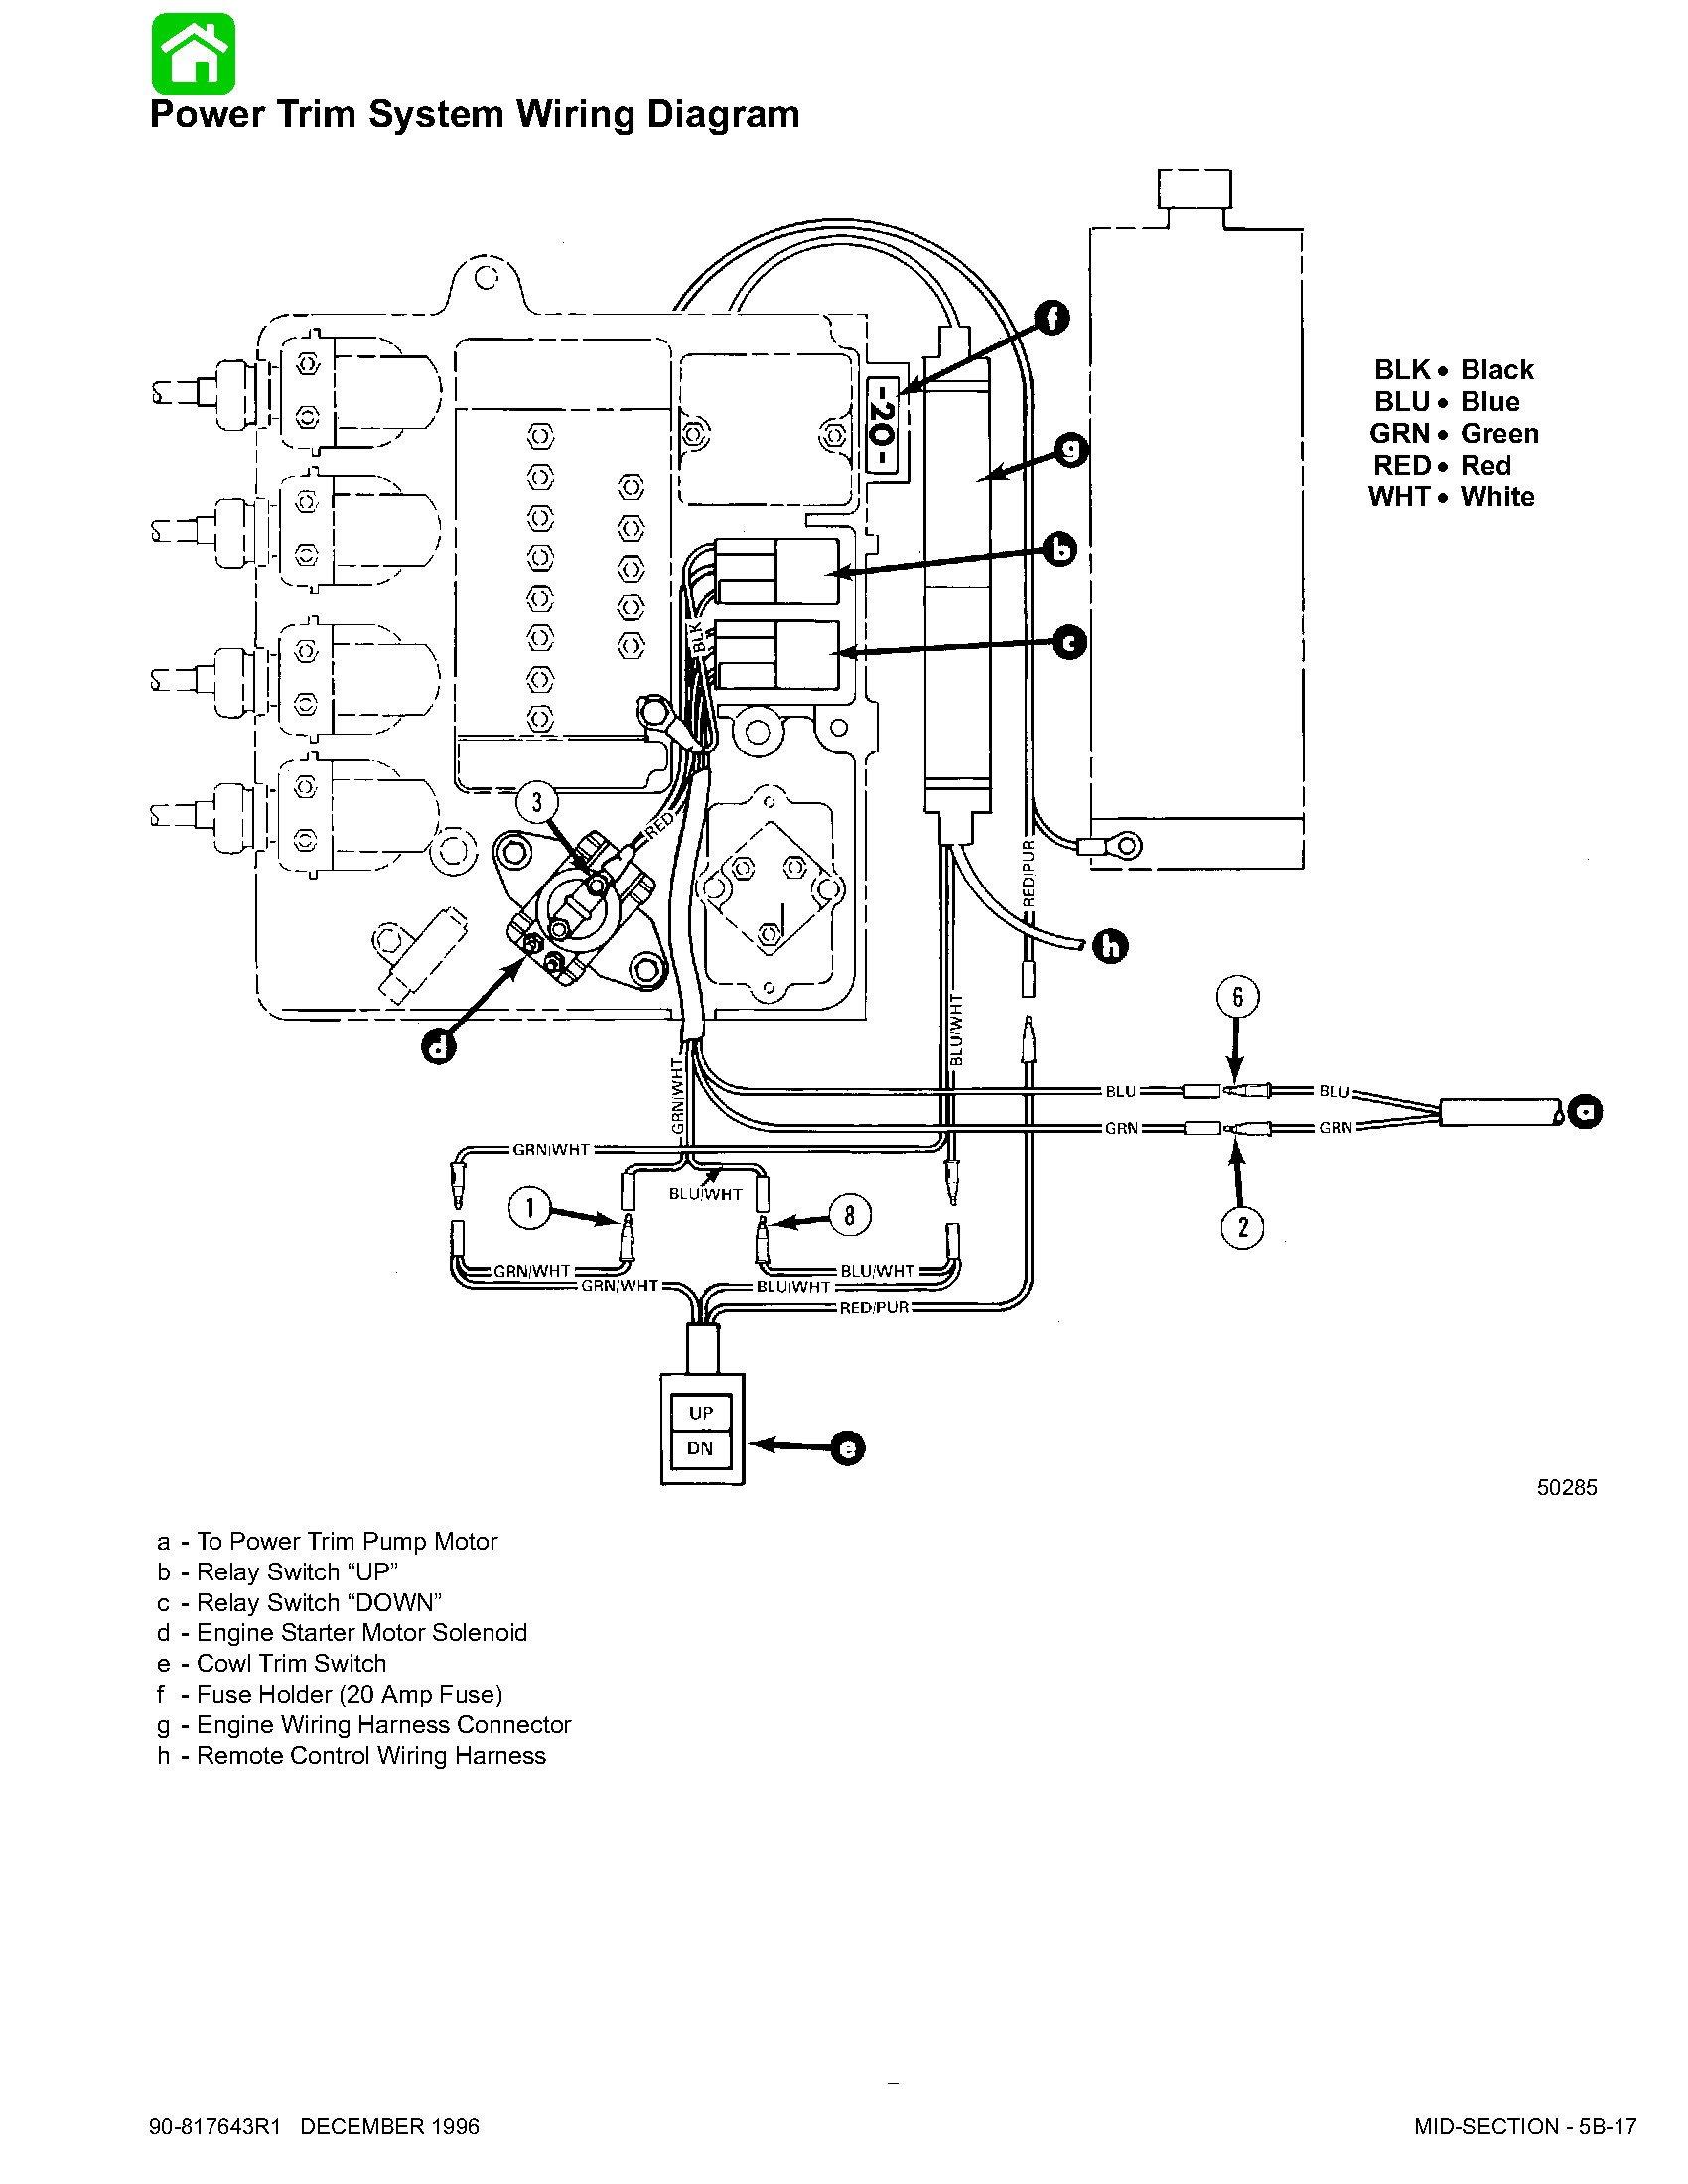 DIAGRAM] Mercury 60hp 2 Stroke Wiring Diagram FULL Version HD Quality Wiring  Diagram - HOAWIRINGPDF.ALBATROSCHAMBRESDHOTES.FR Wiring And Fuse Database